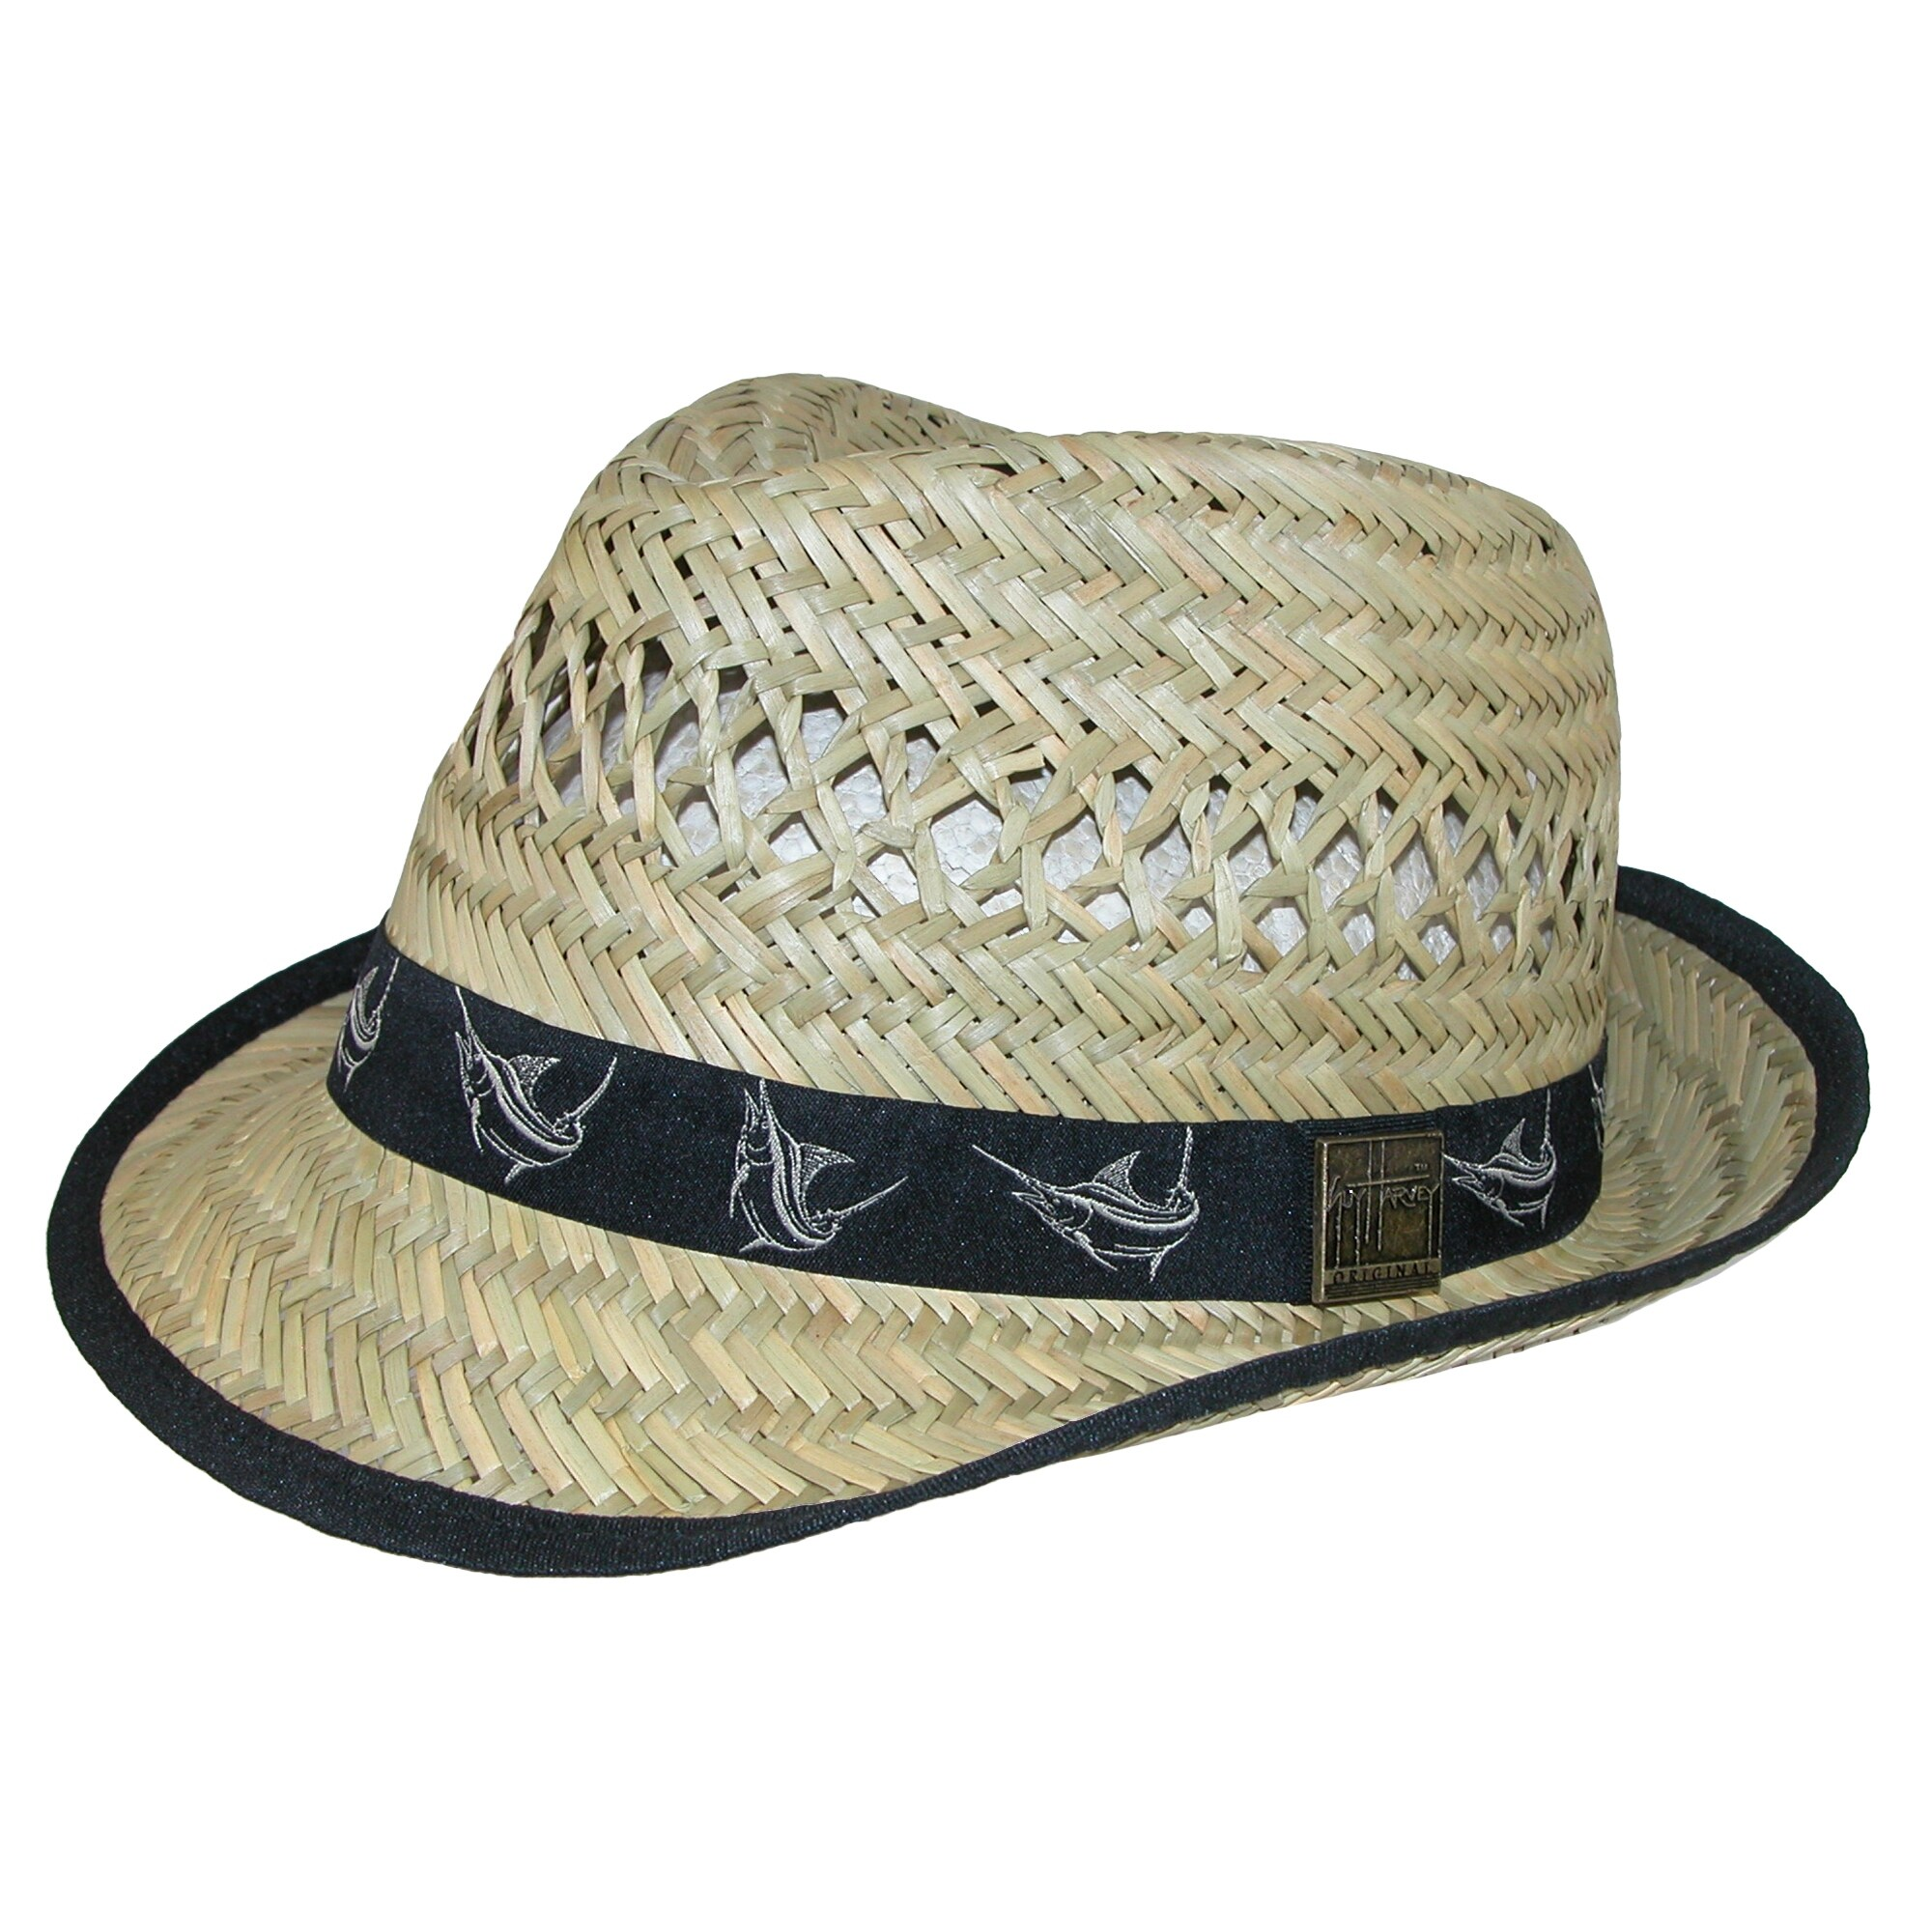 bbd0b16c Mens Straw Hats Online